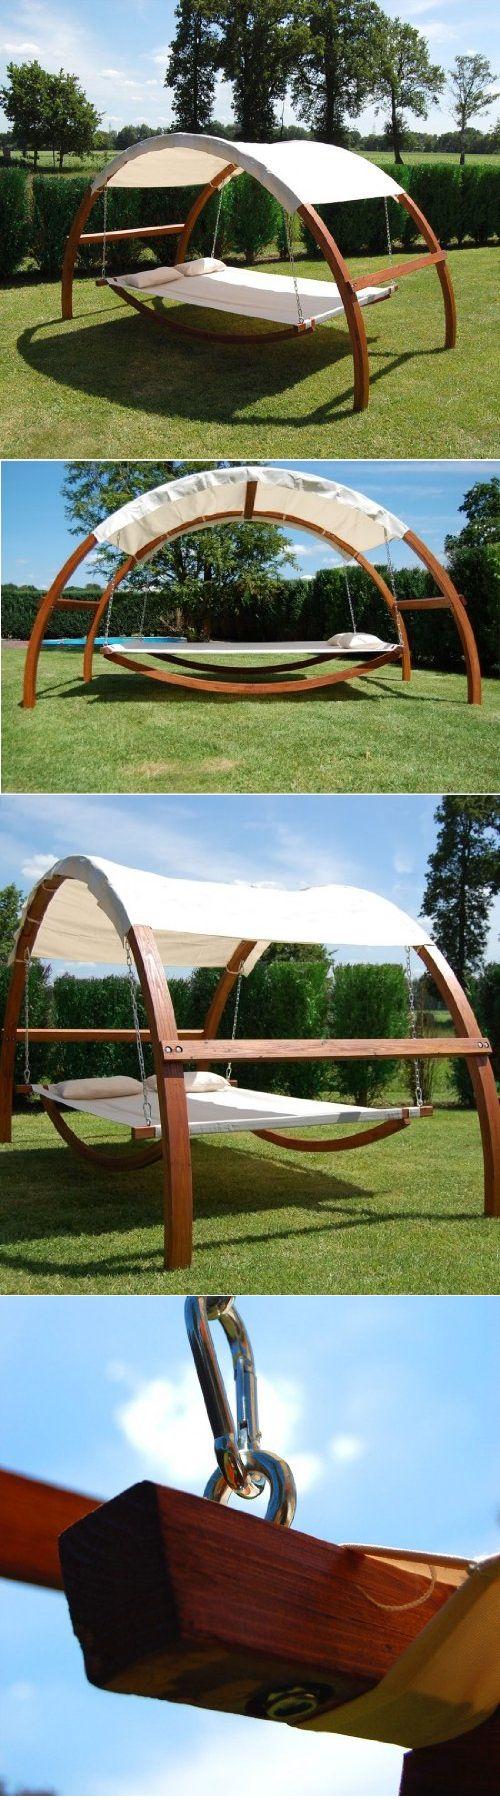 Best 25+ Swing beds ideas on Pinterest | Porch bed, Porch swings ...